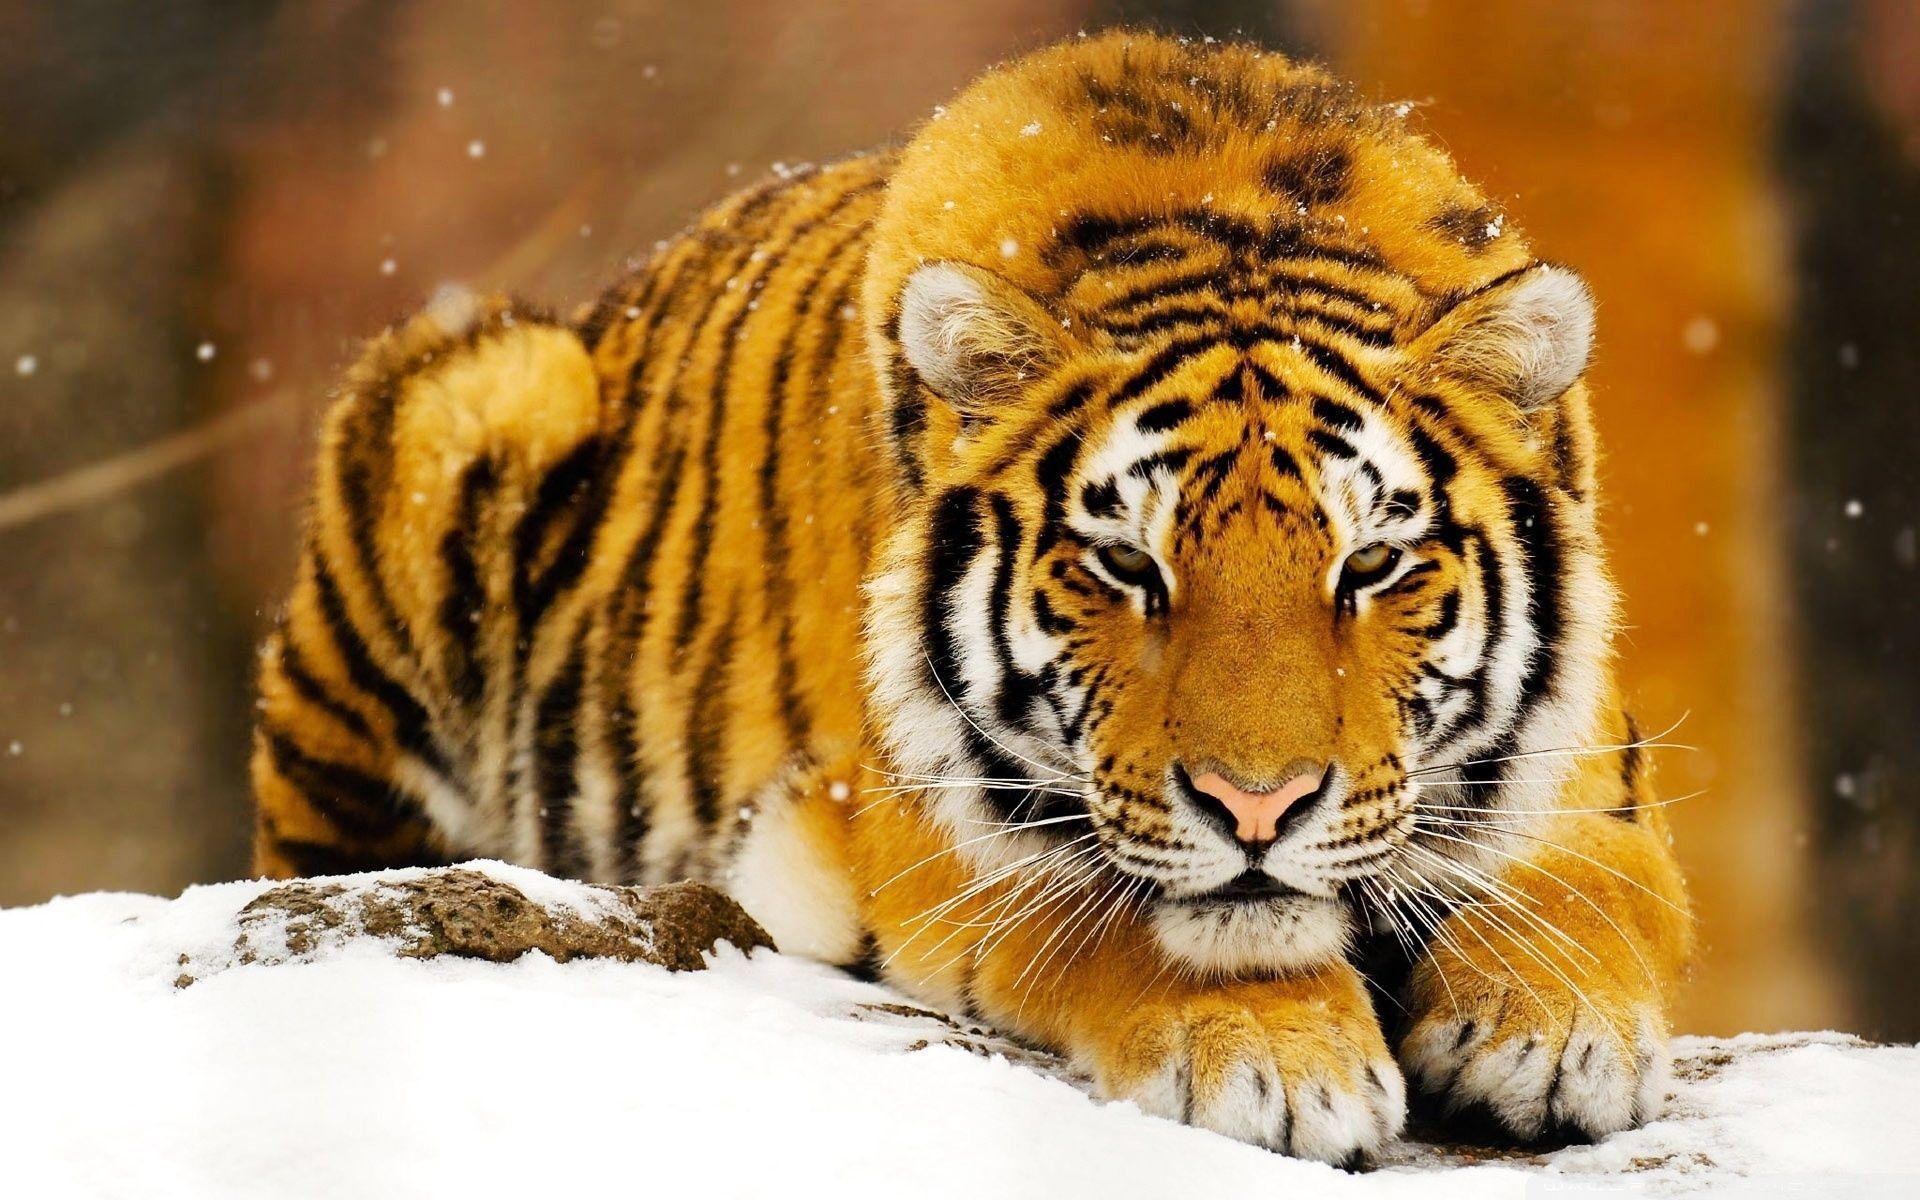 Siberian Tiger Wallpapers - Full HD wallpaper search